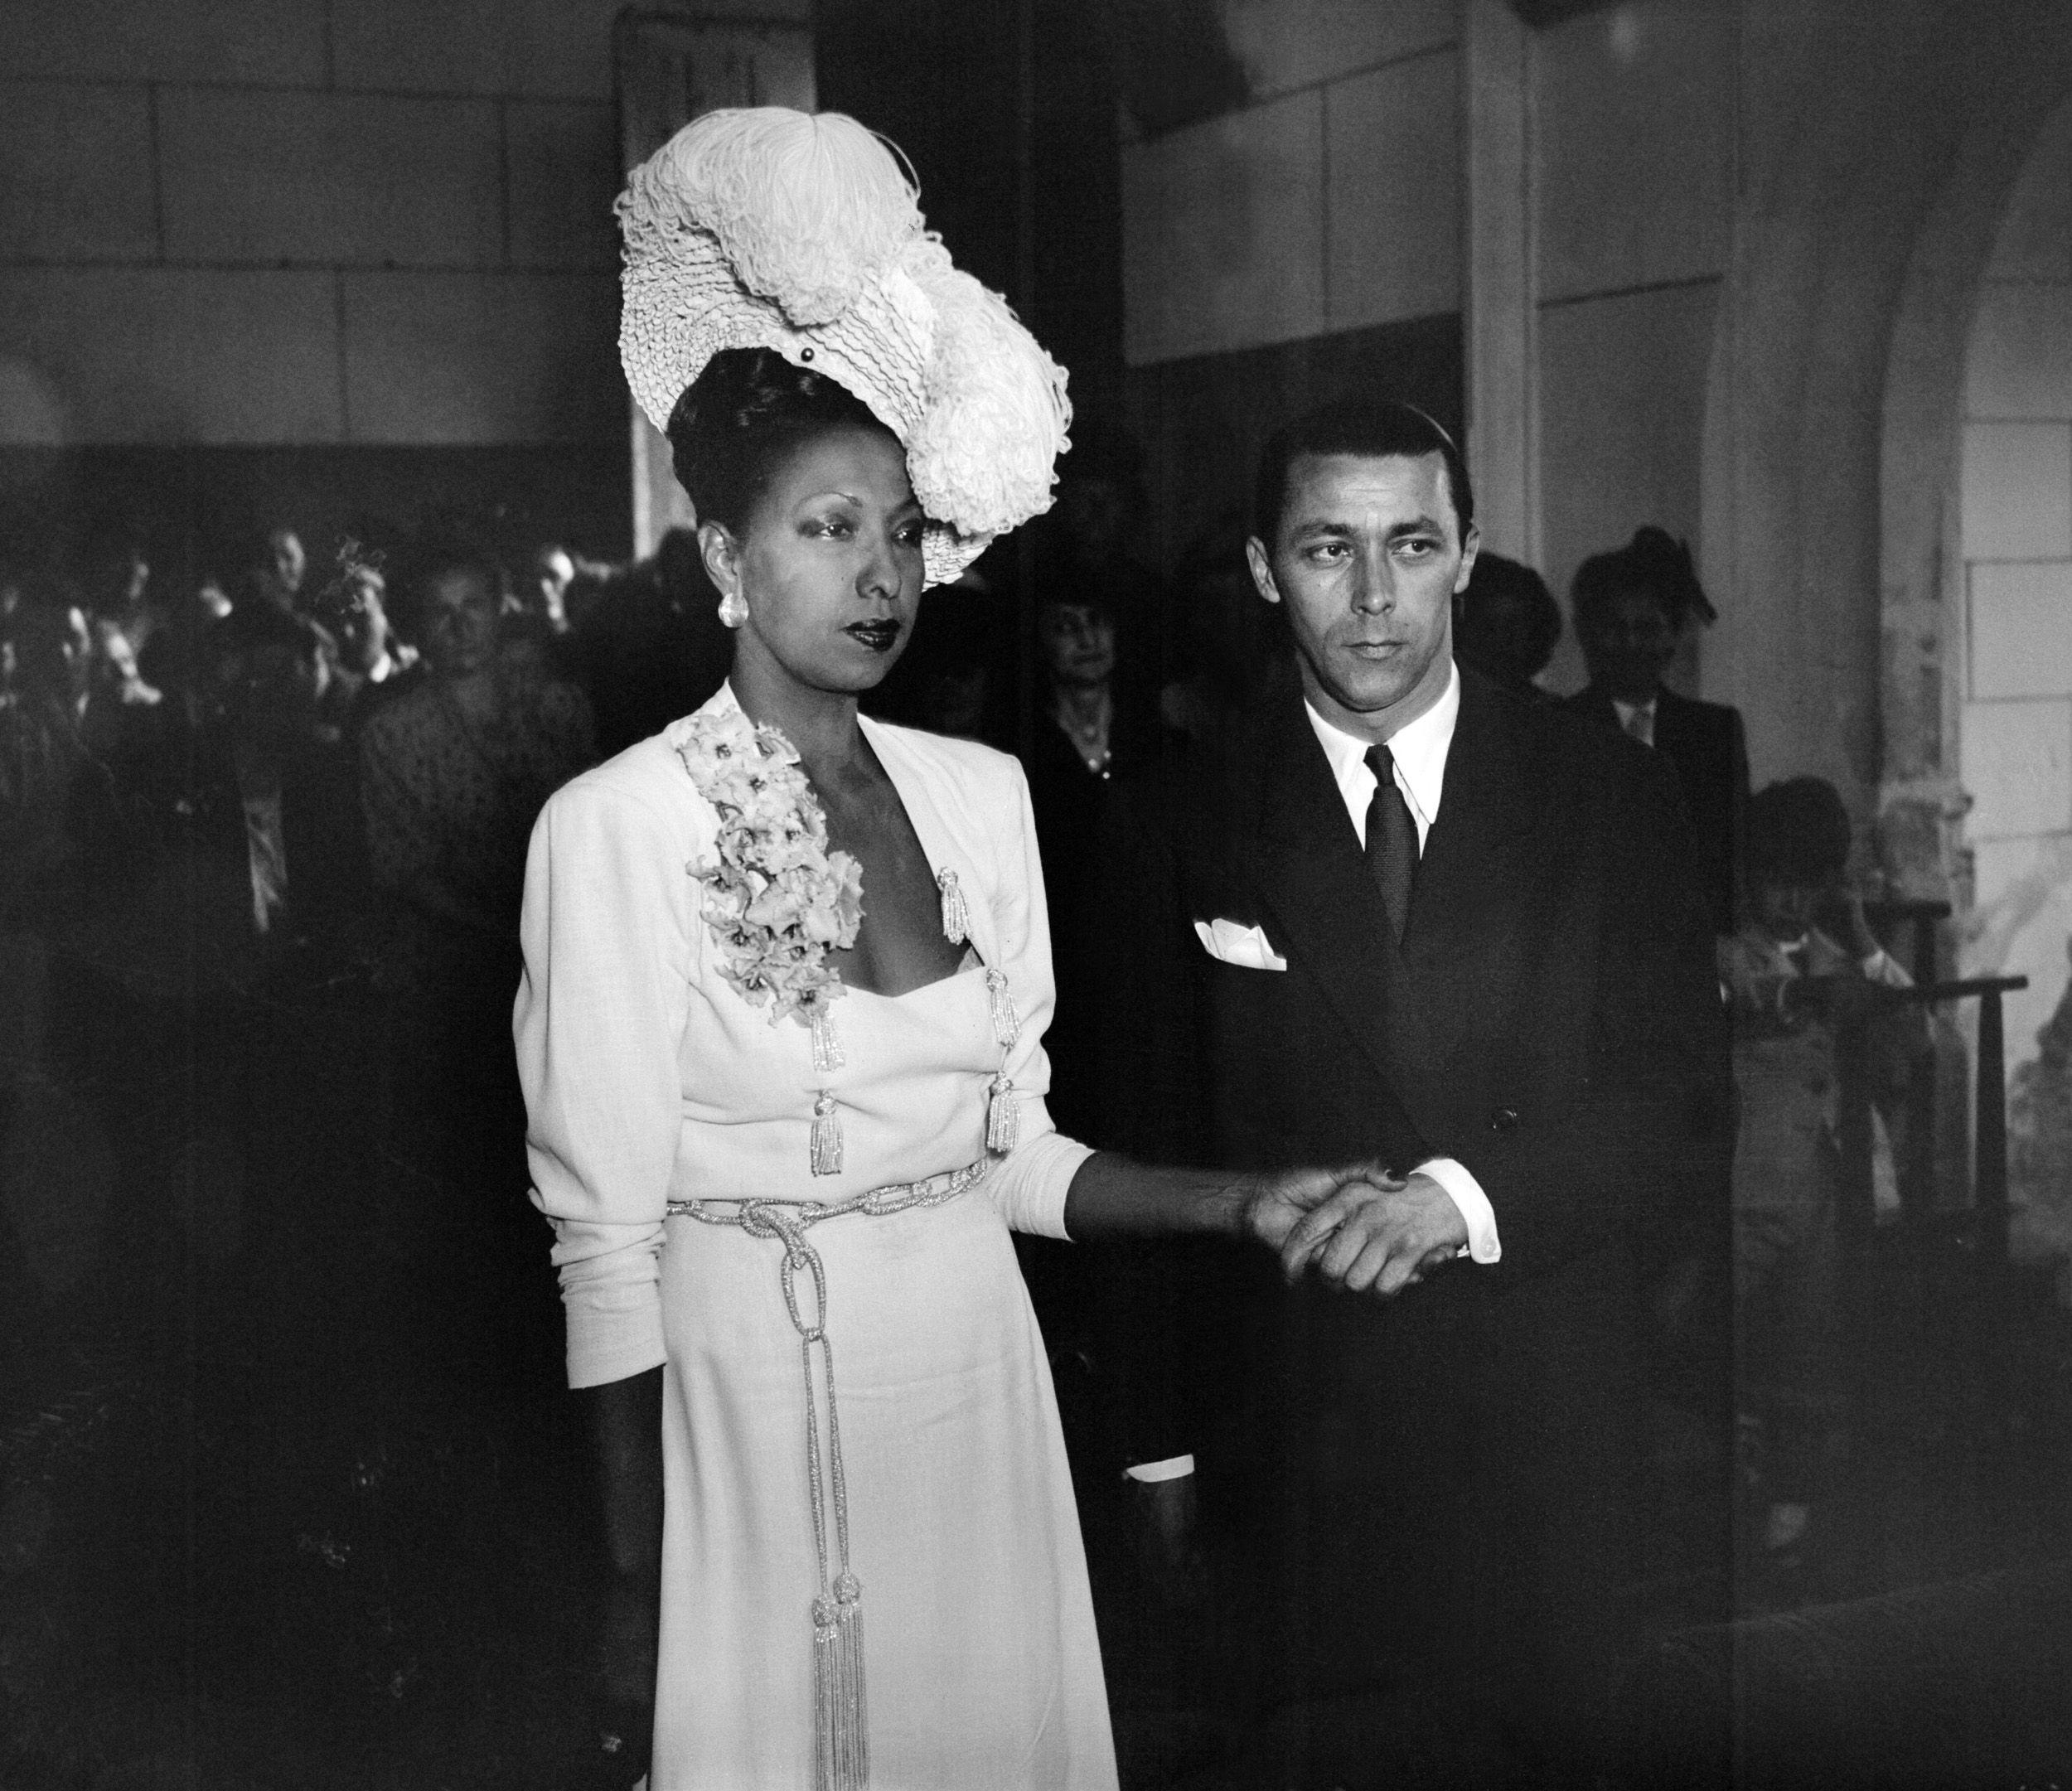 Josephine Baker's Life in Photos